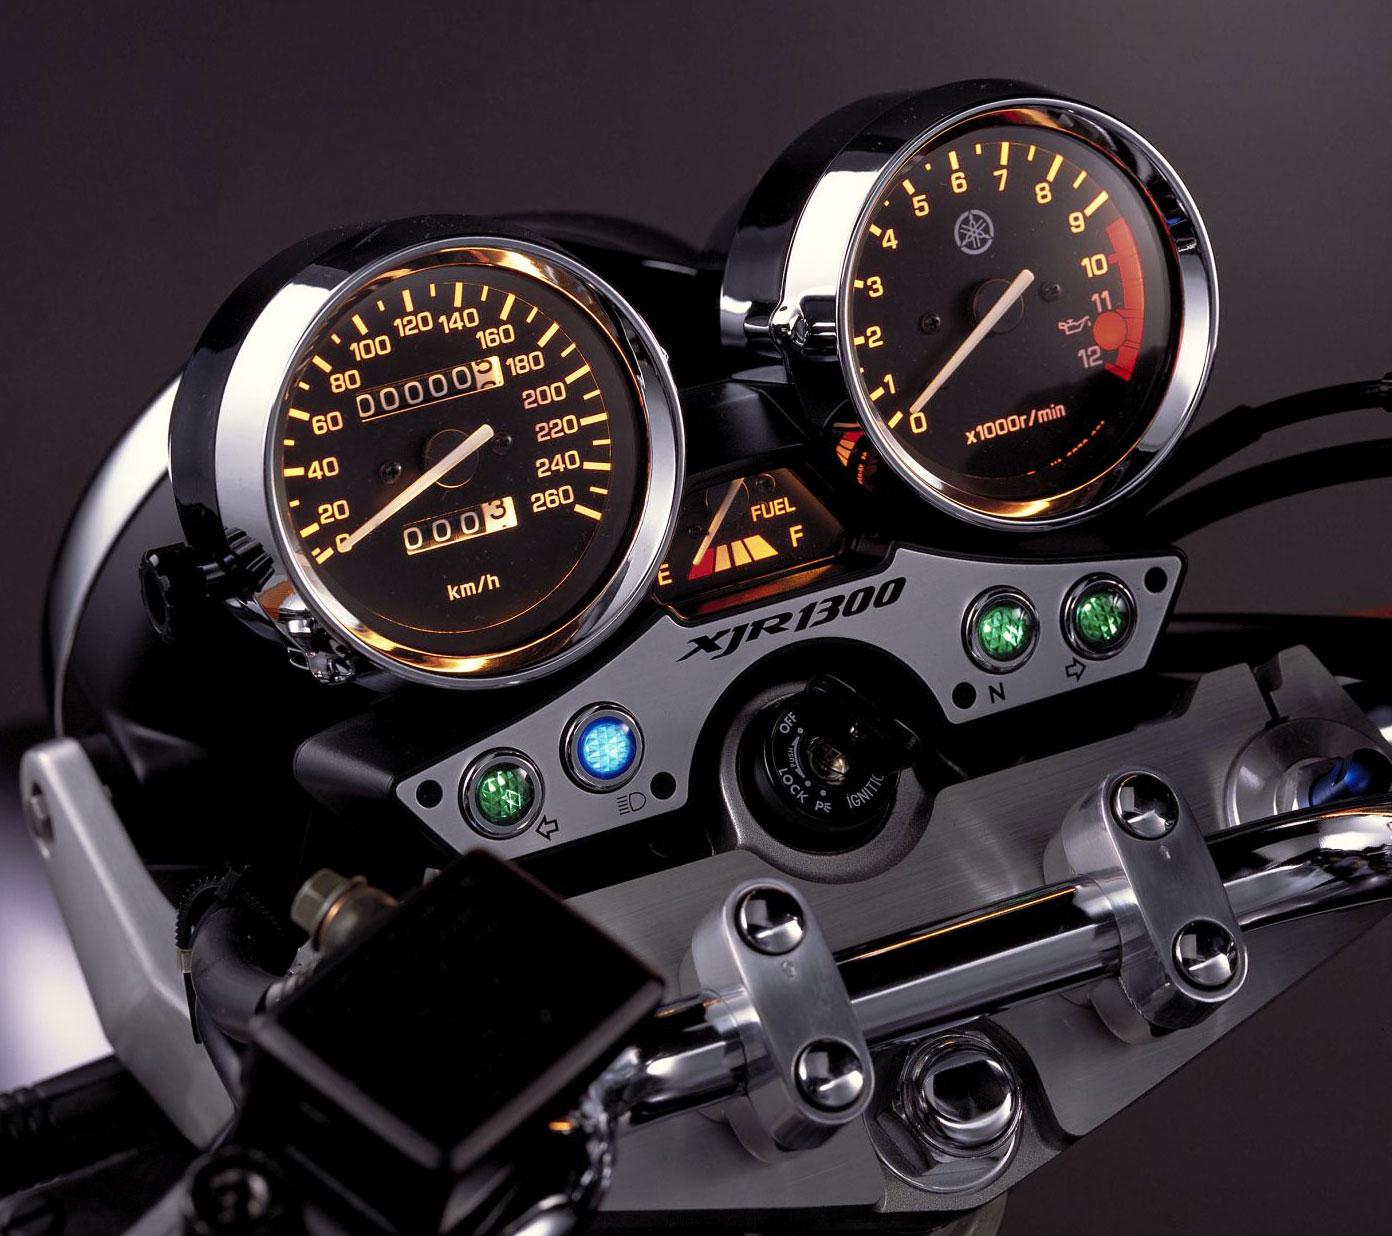 2002-Yamaha-XJR1300z.jpg